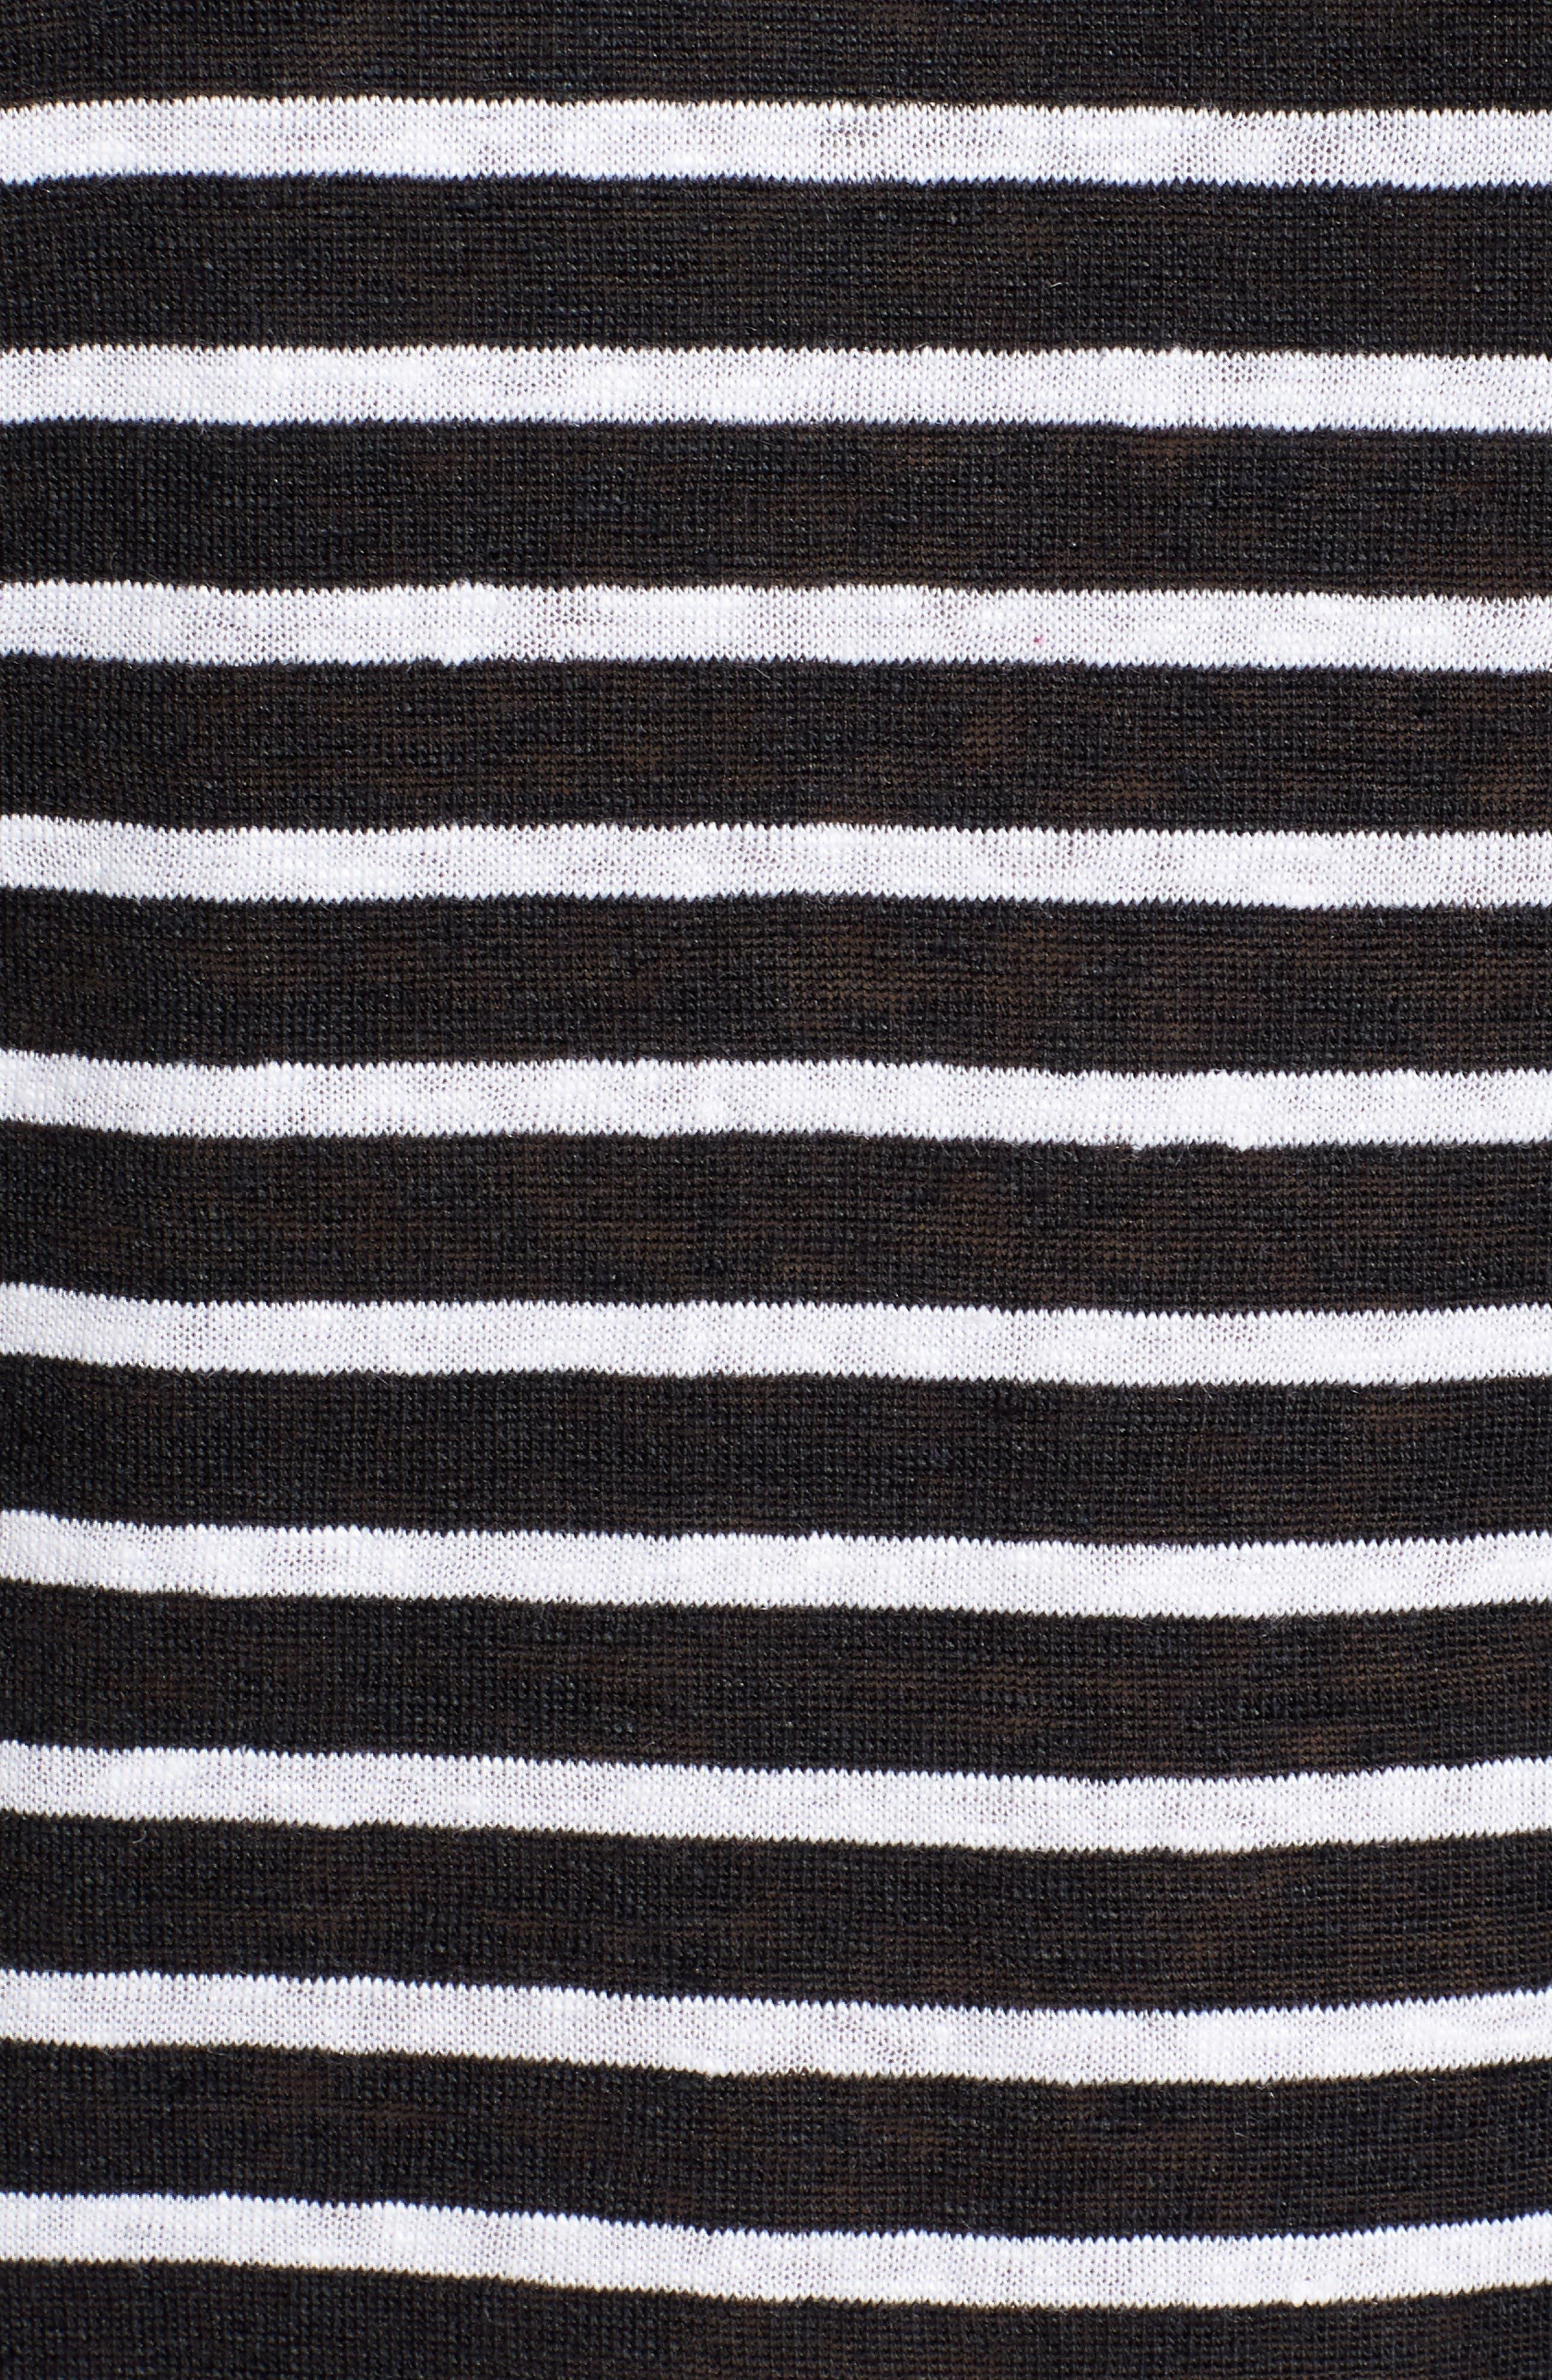 Stripe Organic Linen Top,                             Alternate thumbnail 6, color,                             Black/ White